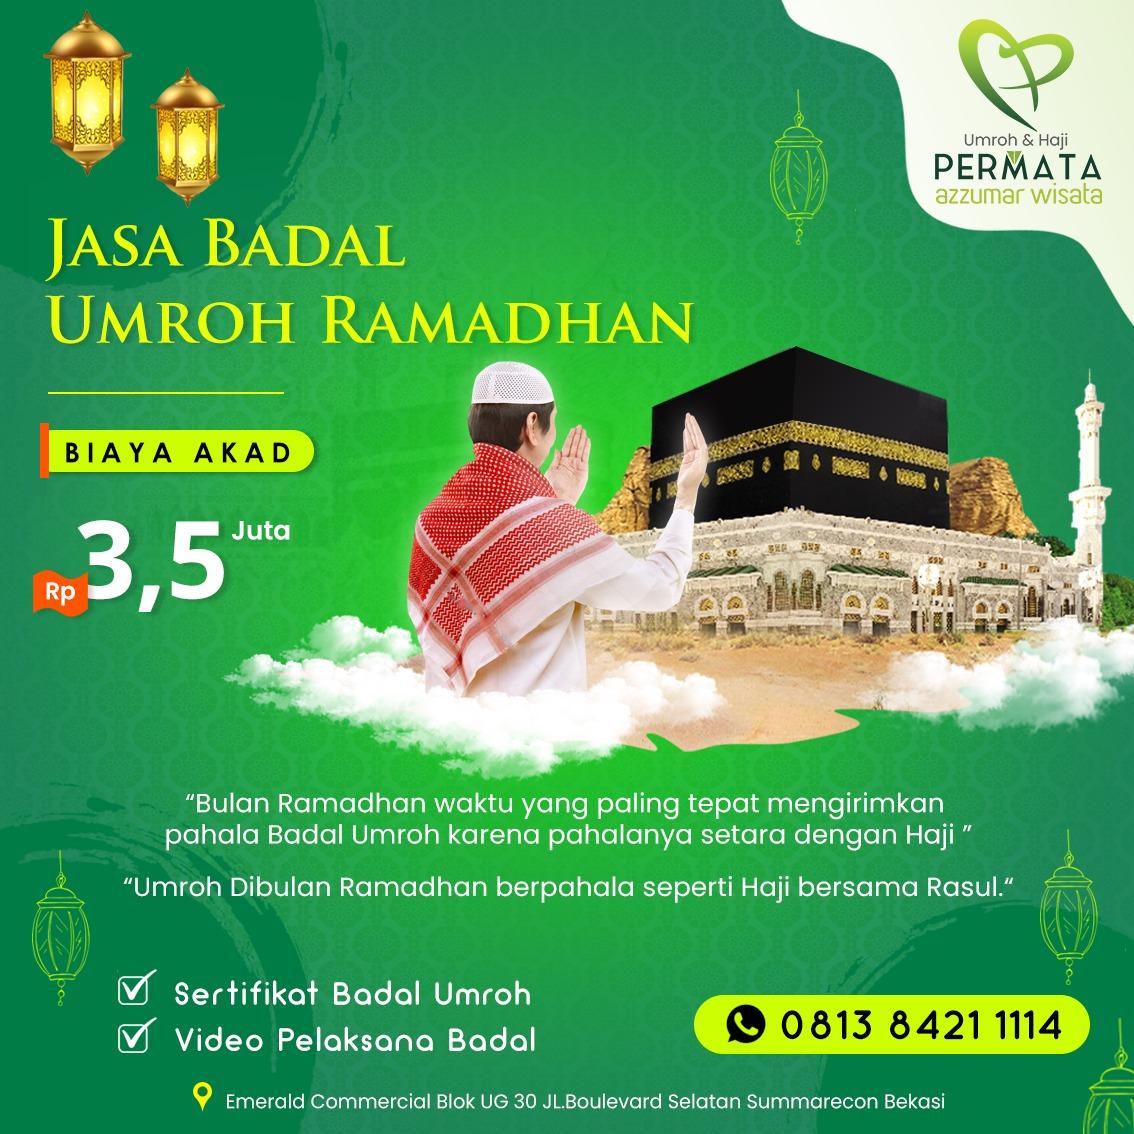 paket biaya jasa badal umroh ramadhan resmi bersertifikat